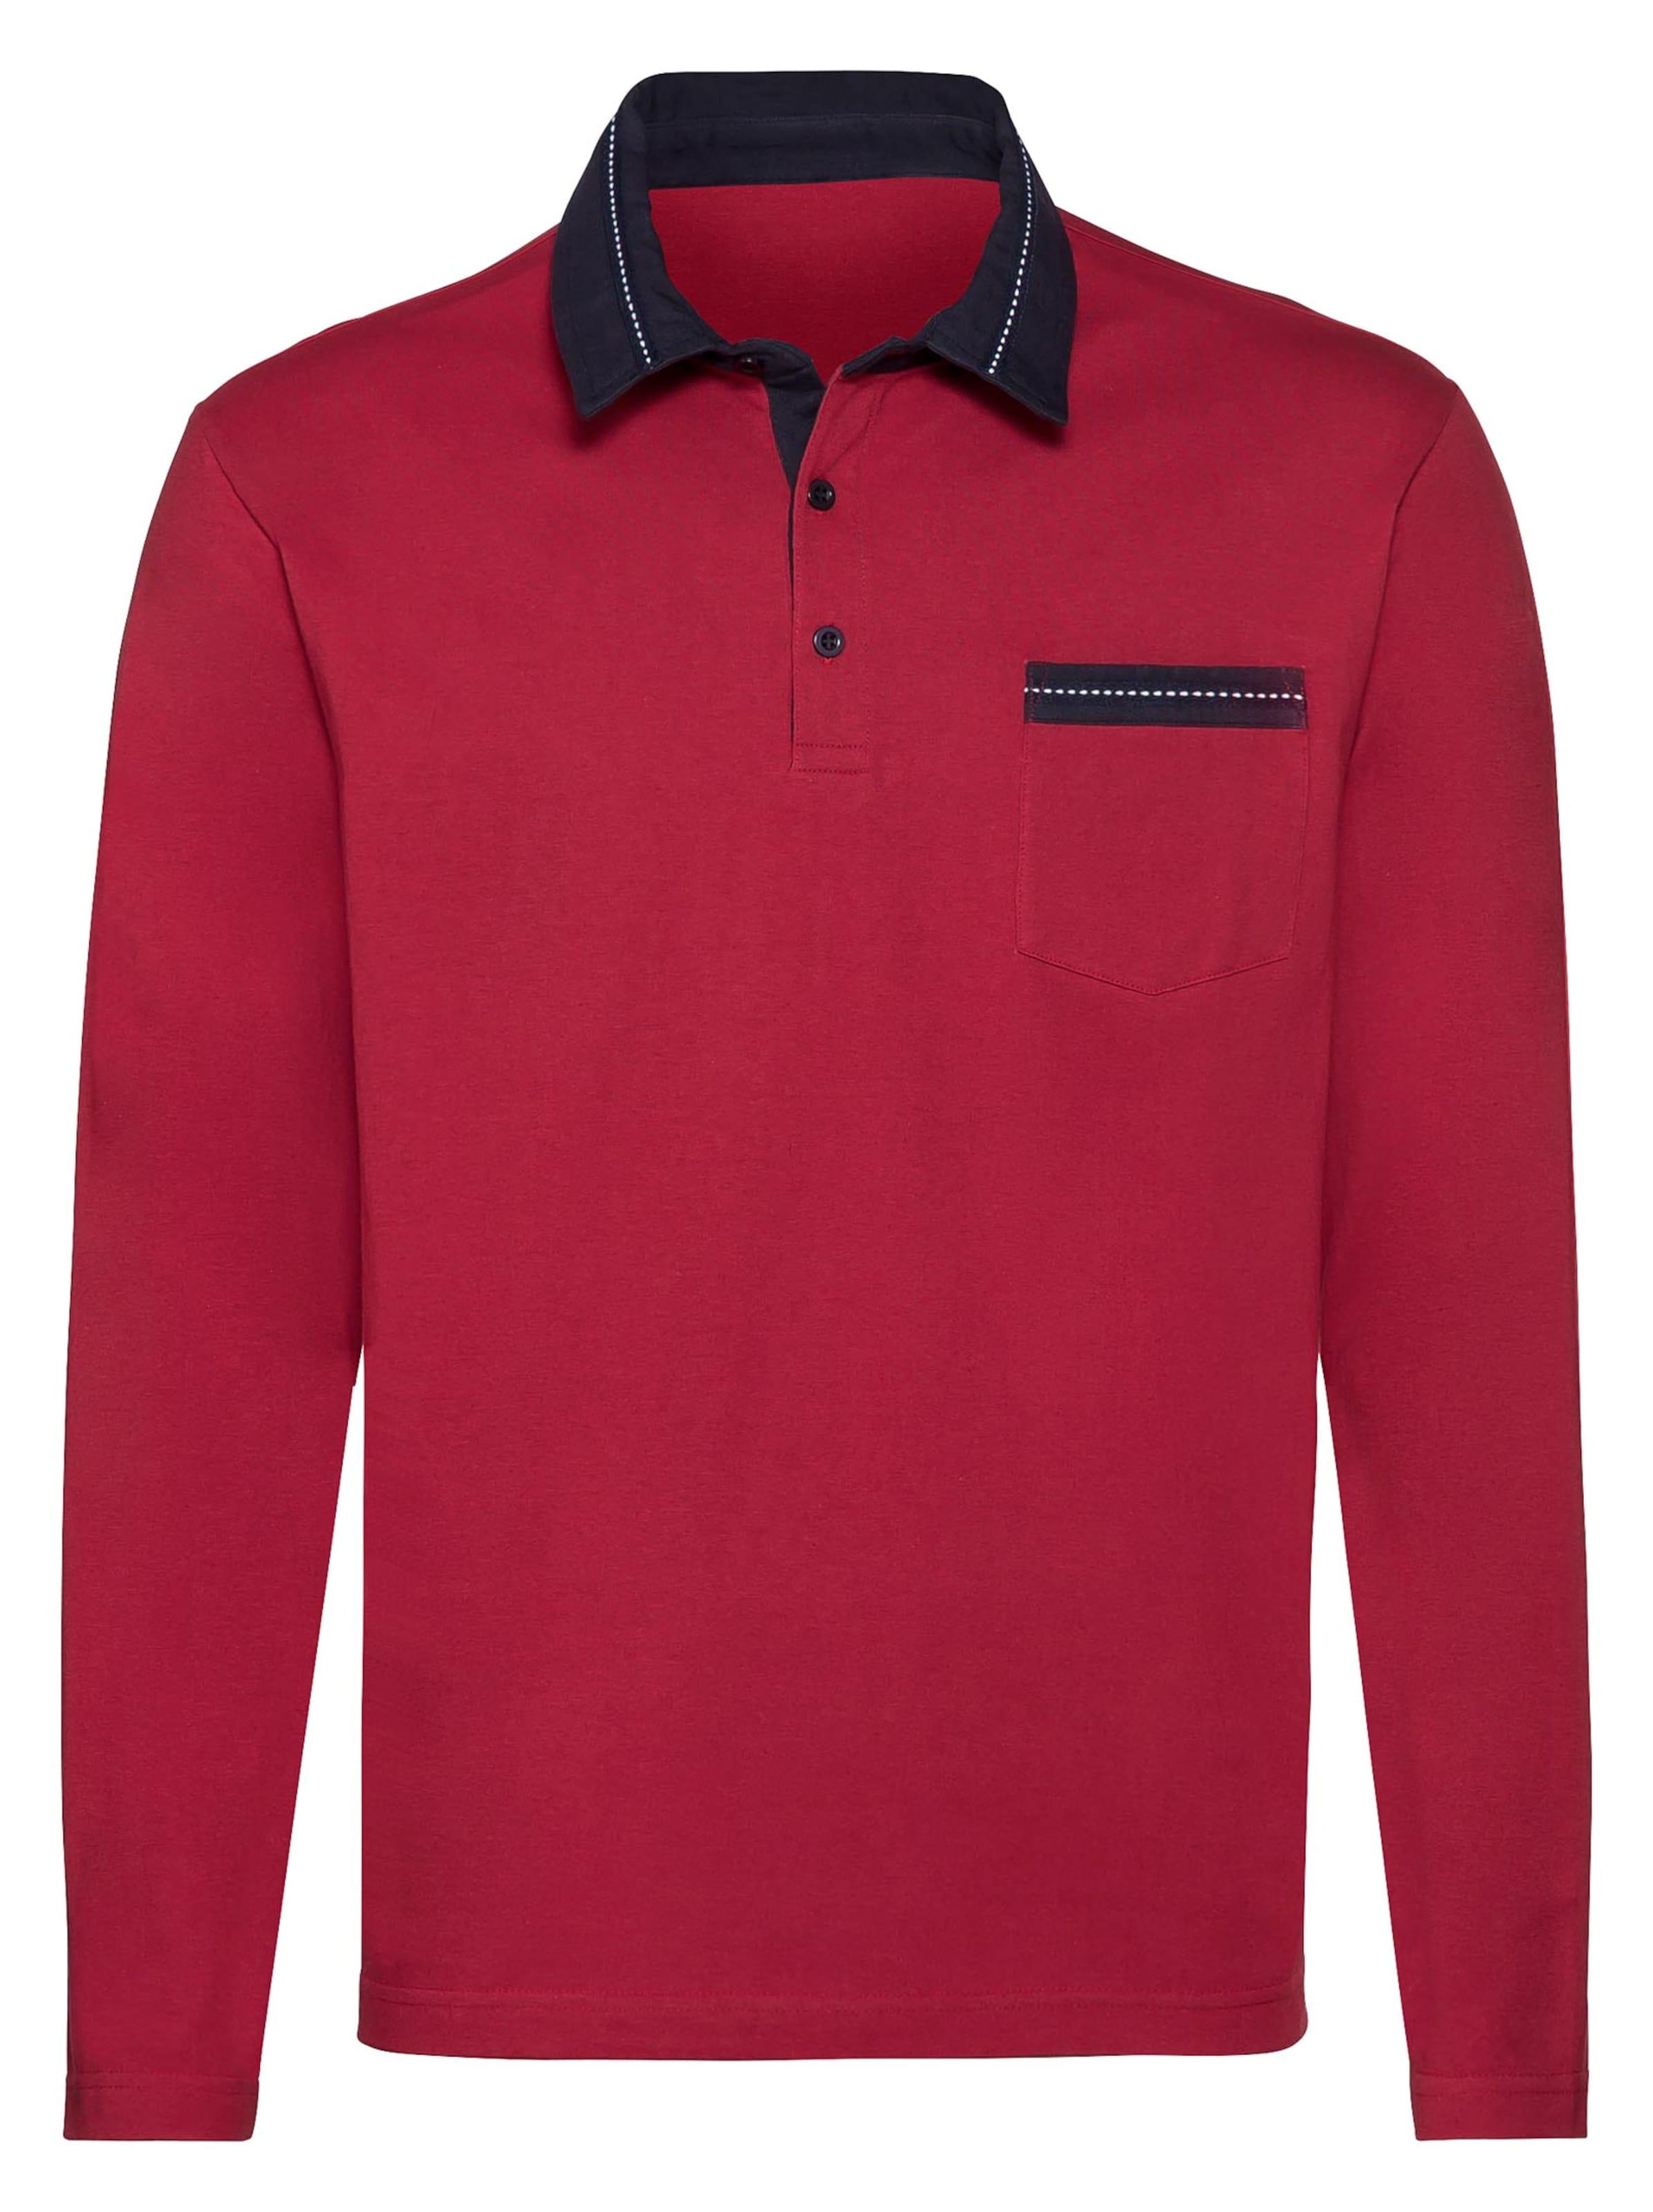 catamaran - Witt Weiden Herren Langarm-Shirt rot